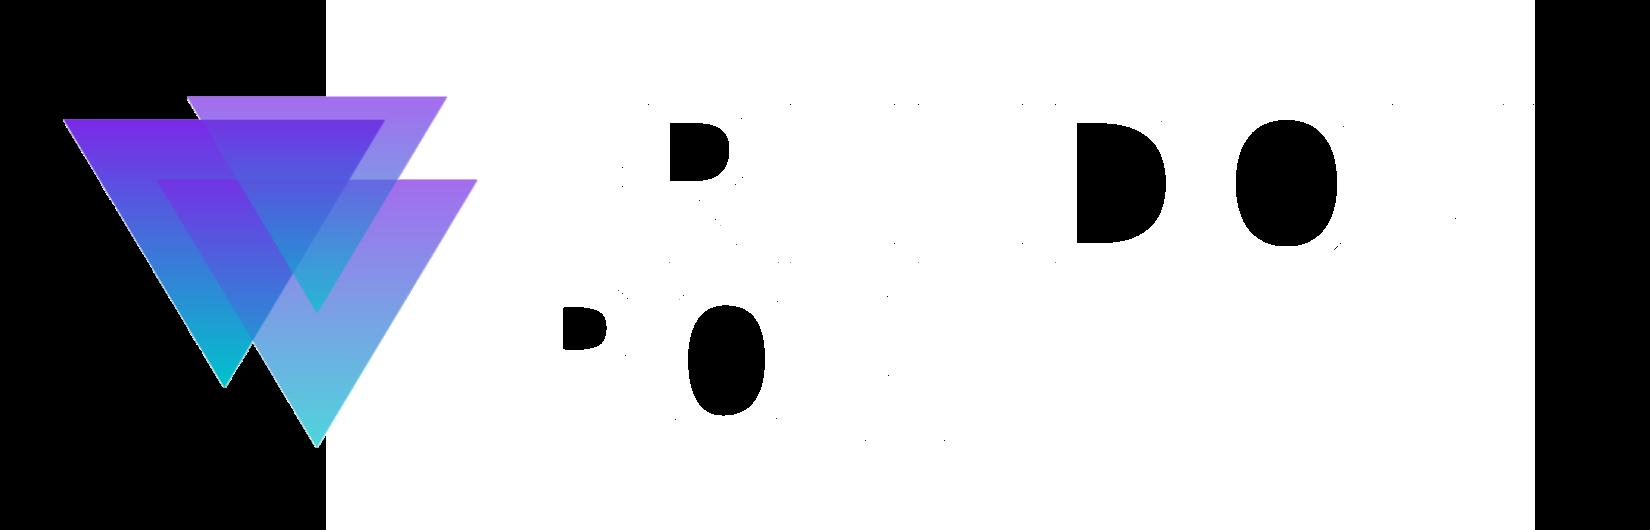 FR-transparent-white-text-1650-x-530.png